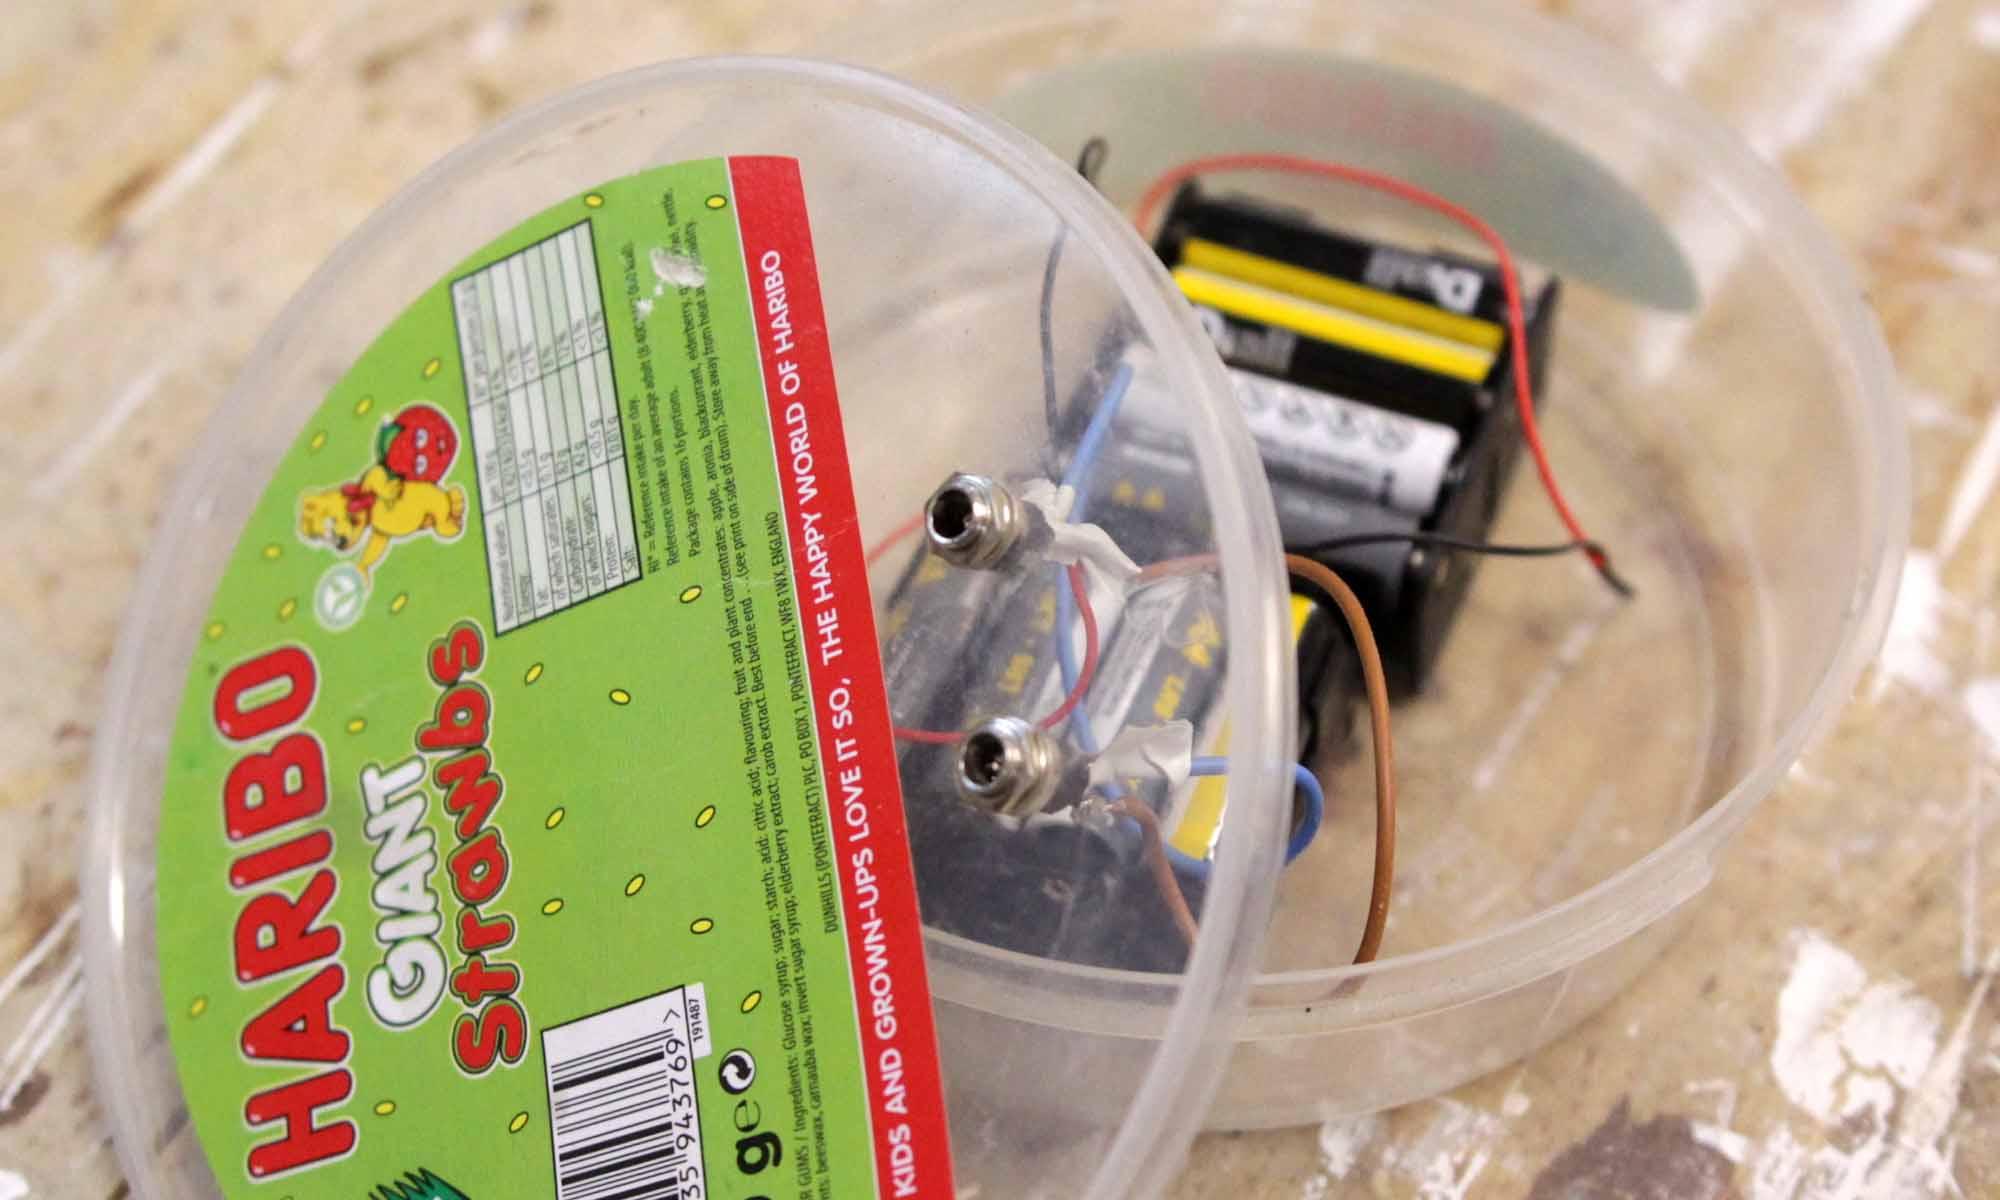 LED Lighting off AA Batteries